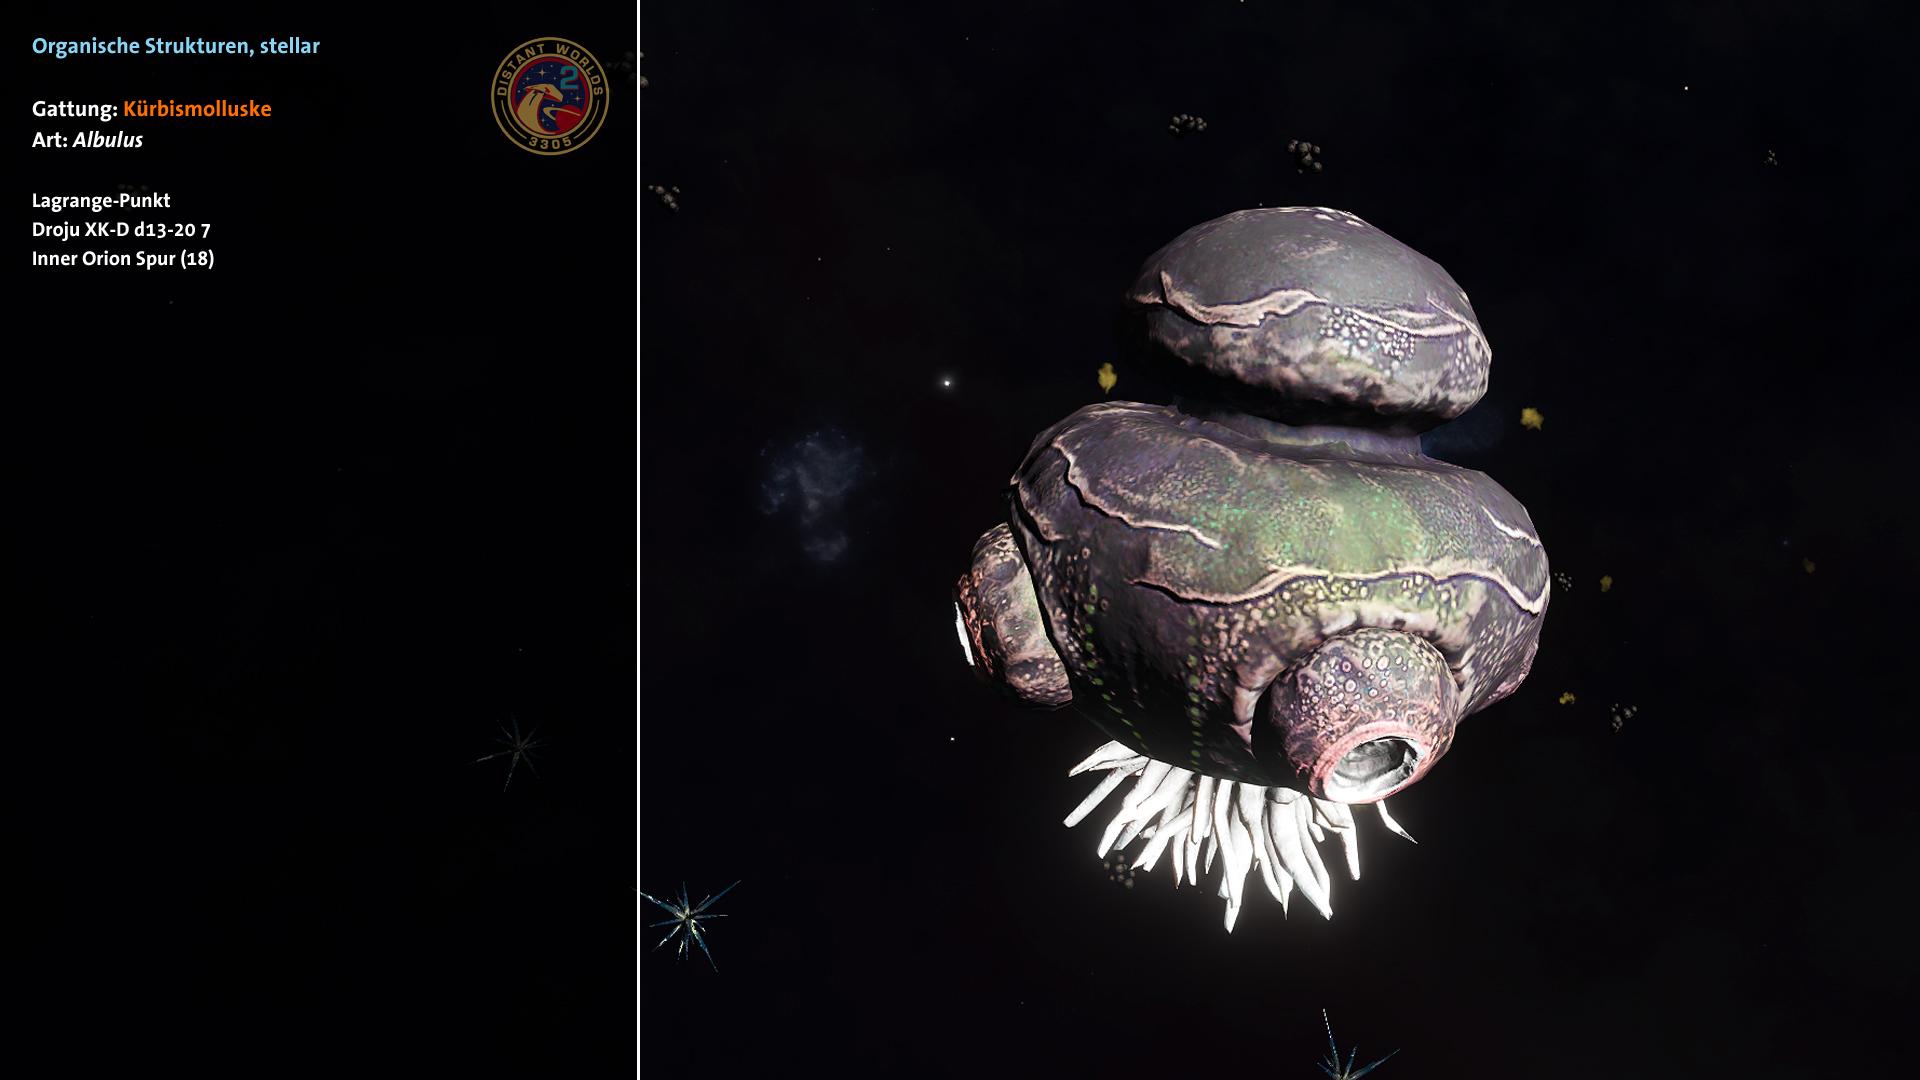 dw2-01-018-biostellar.jpg